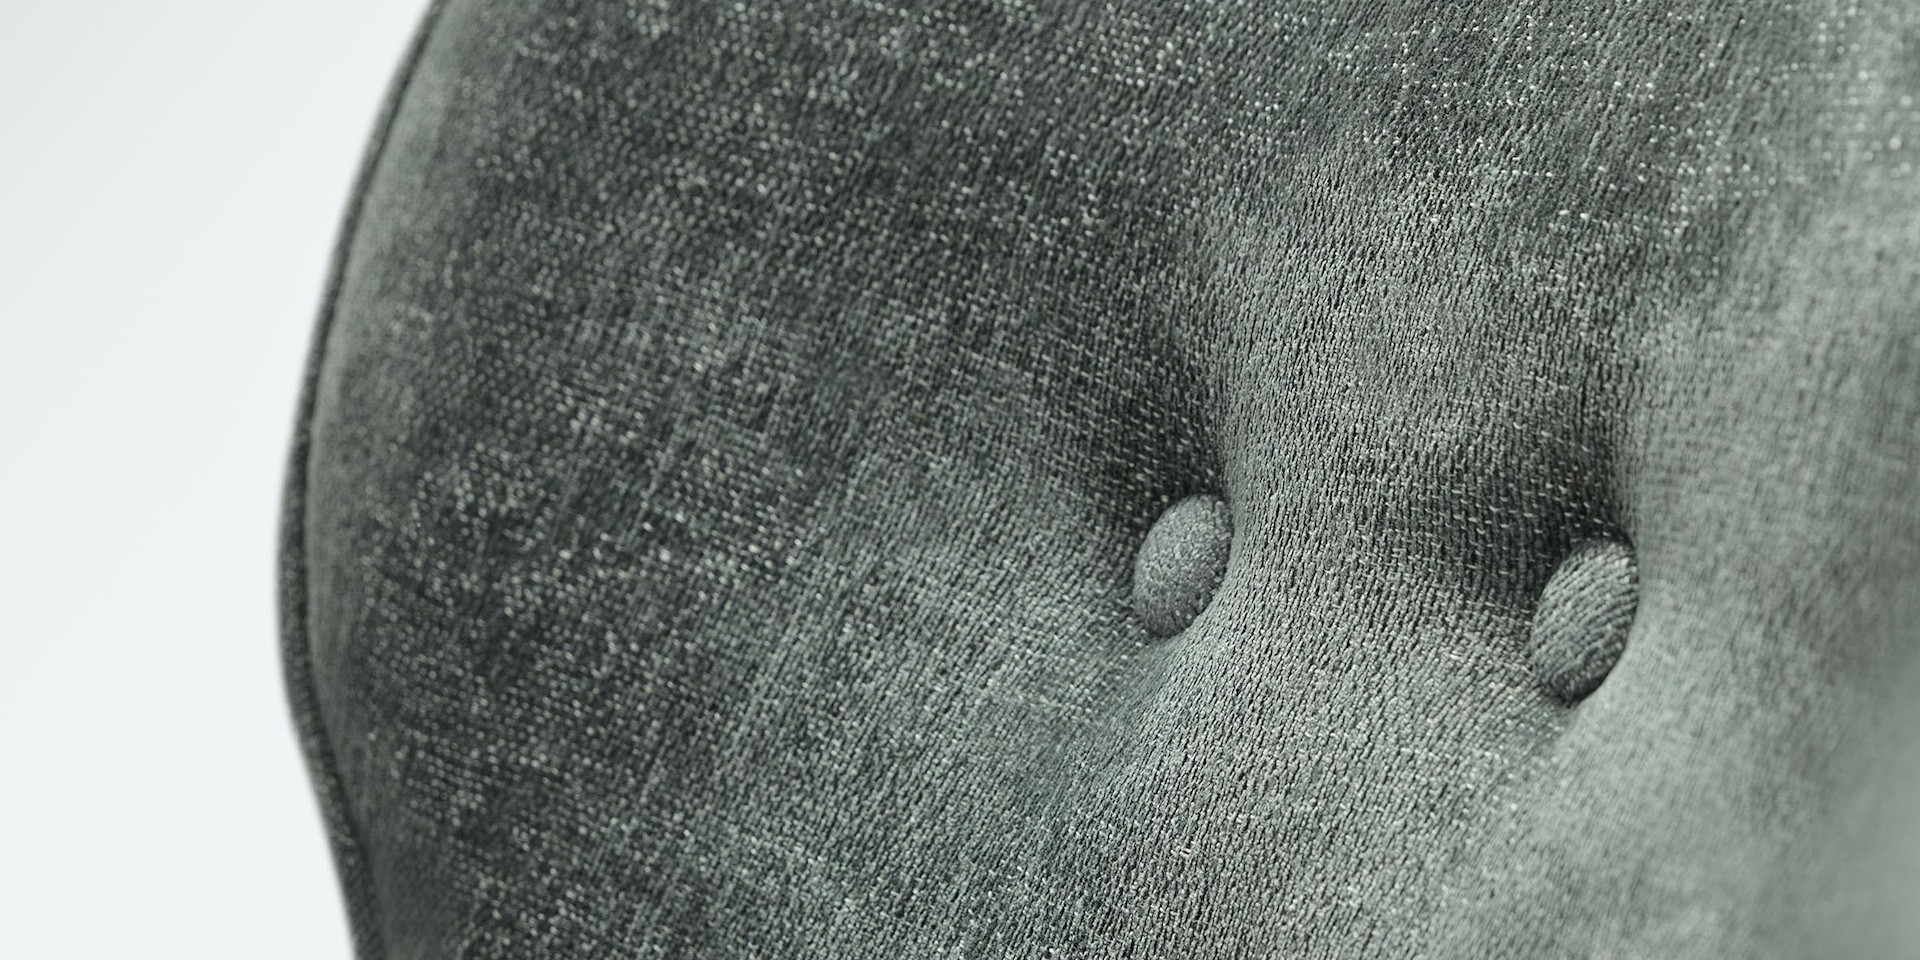 LISA_shadow_armchair_dion13_dark_grey_4